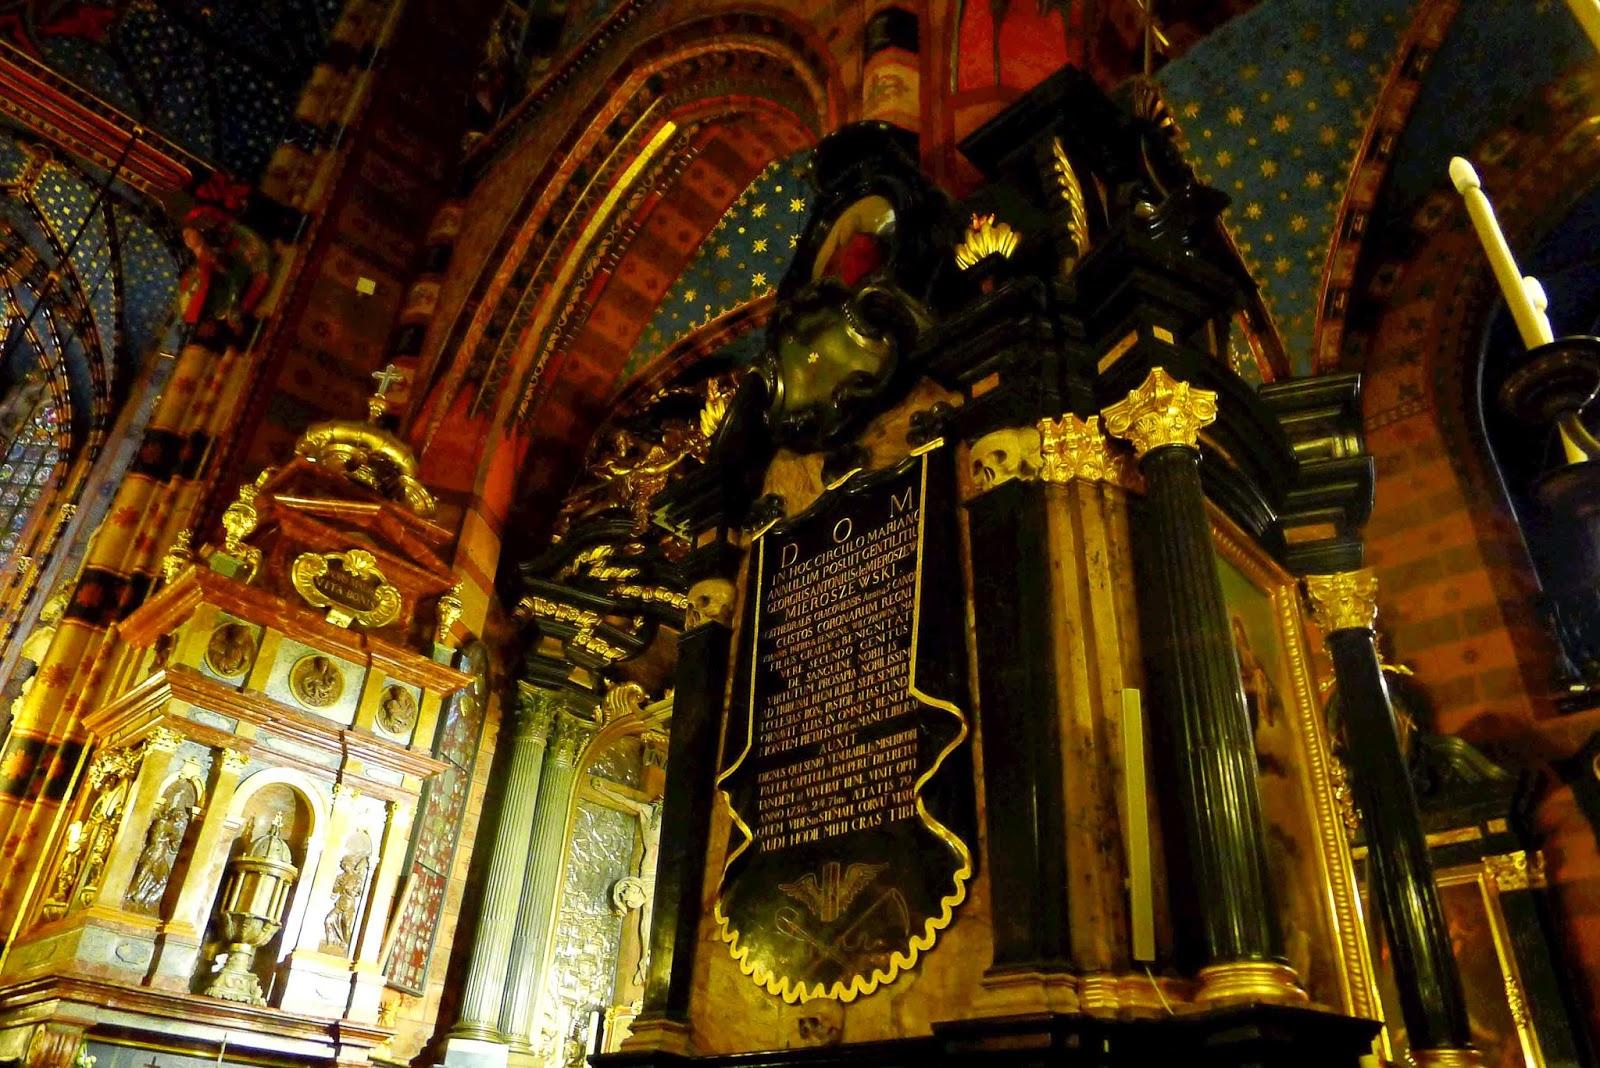 St. Mary's Basilica